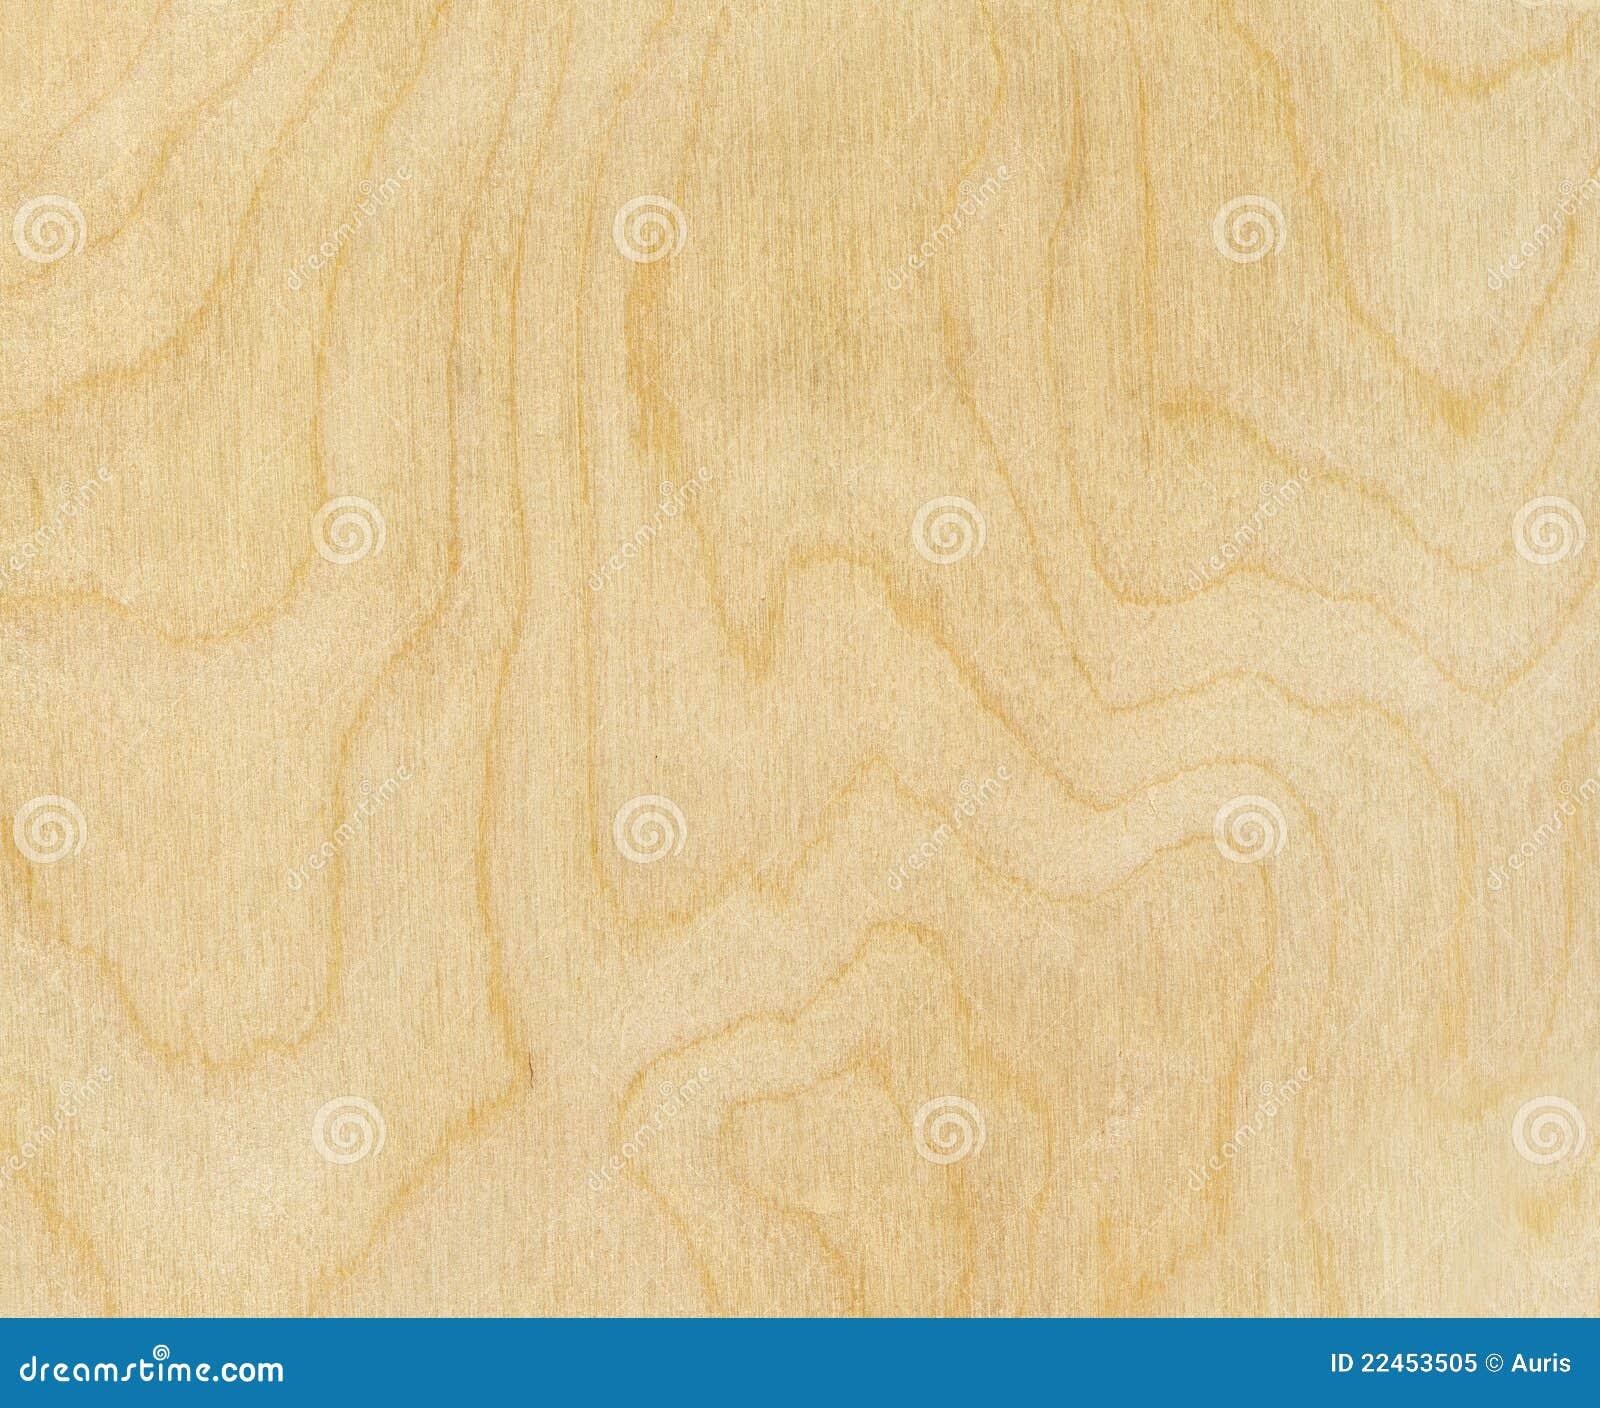 Textura de madera de abedul foto de archivo libre de - Madera de abedul ...